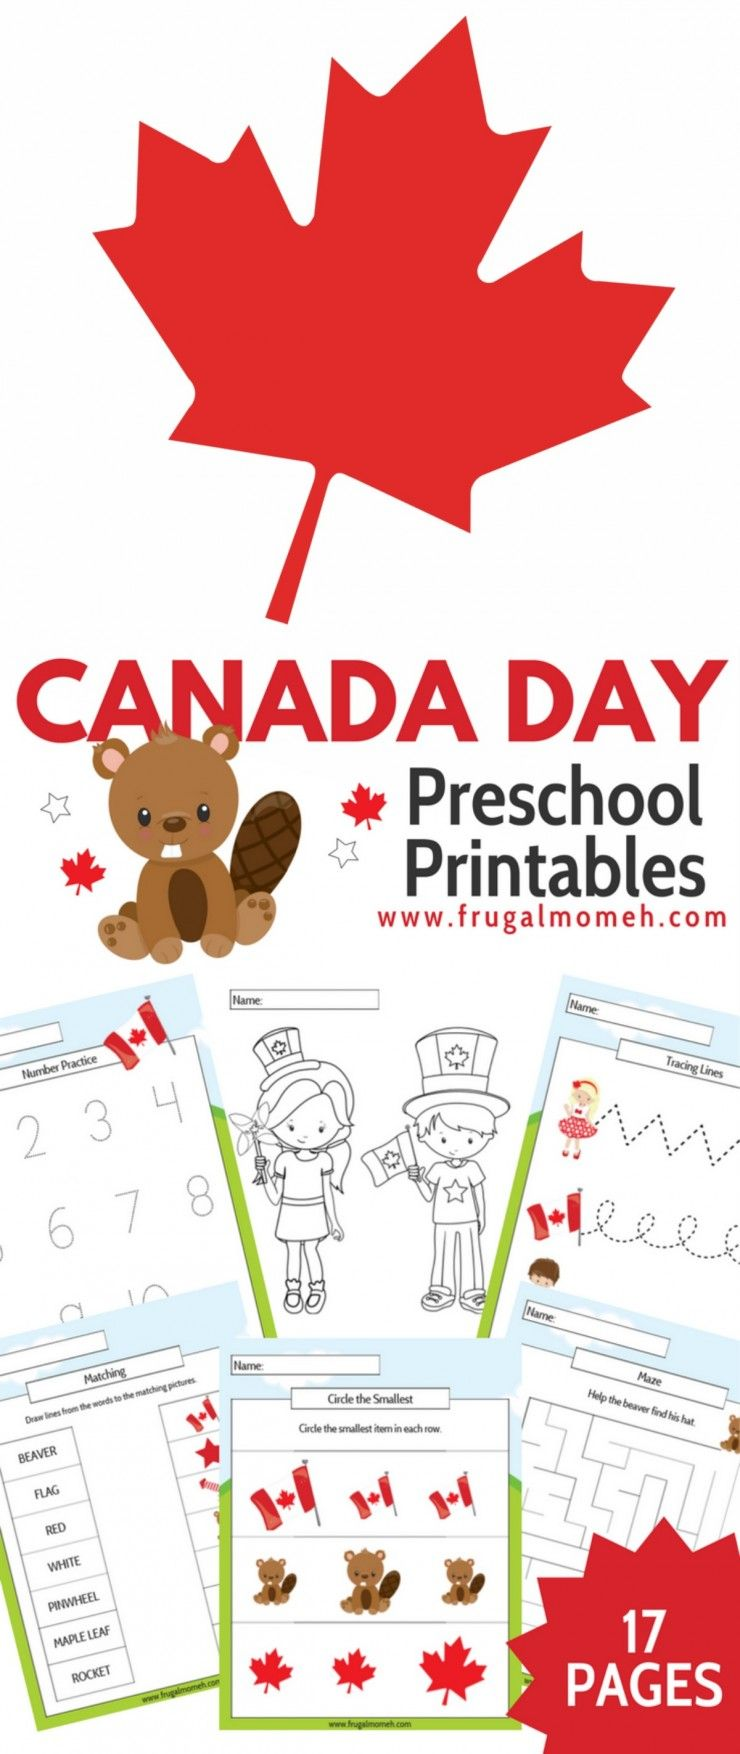 how to become a kindergarten teacher in canada